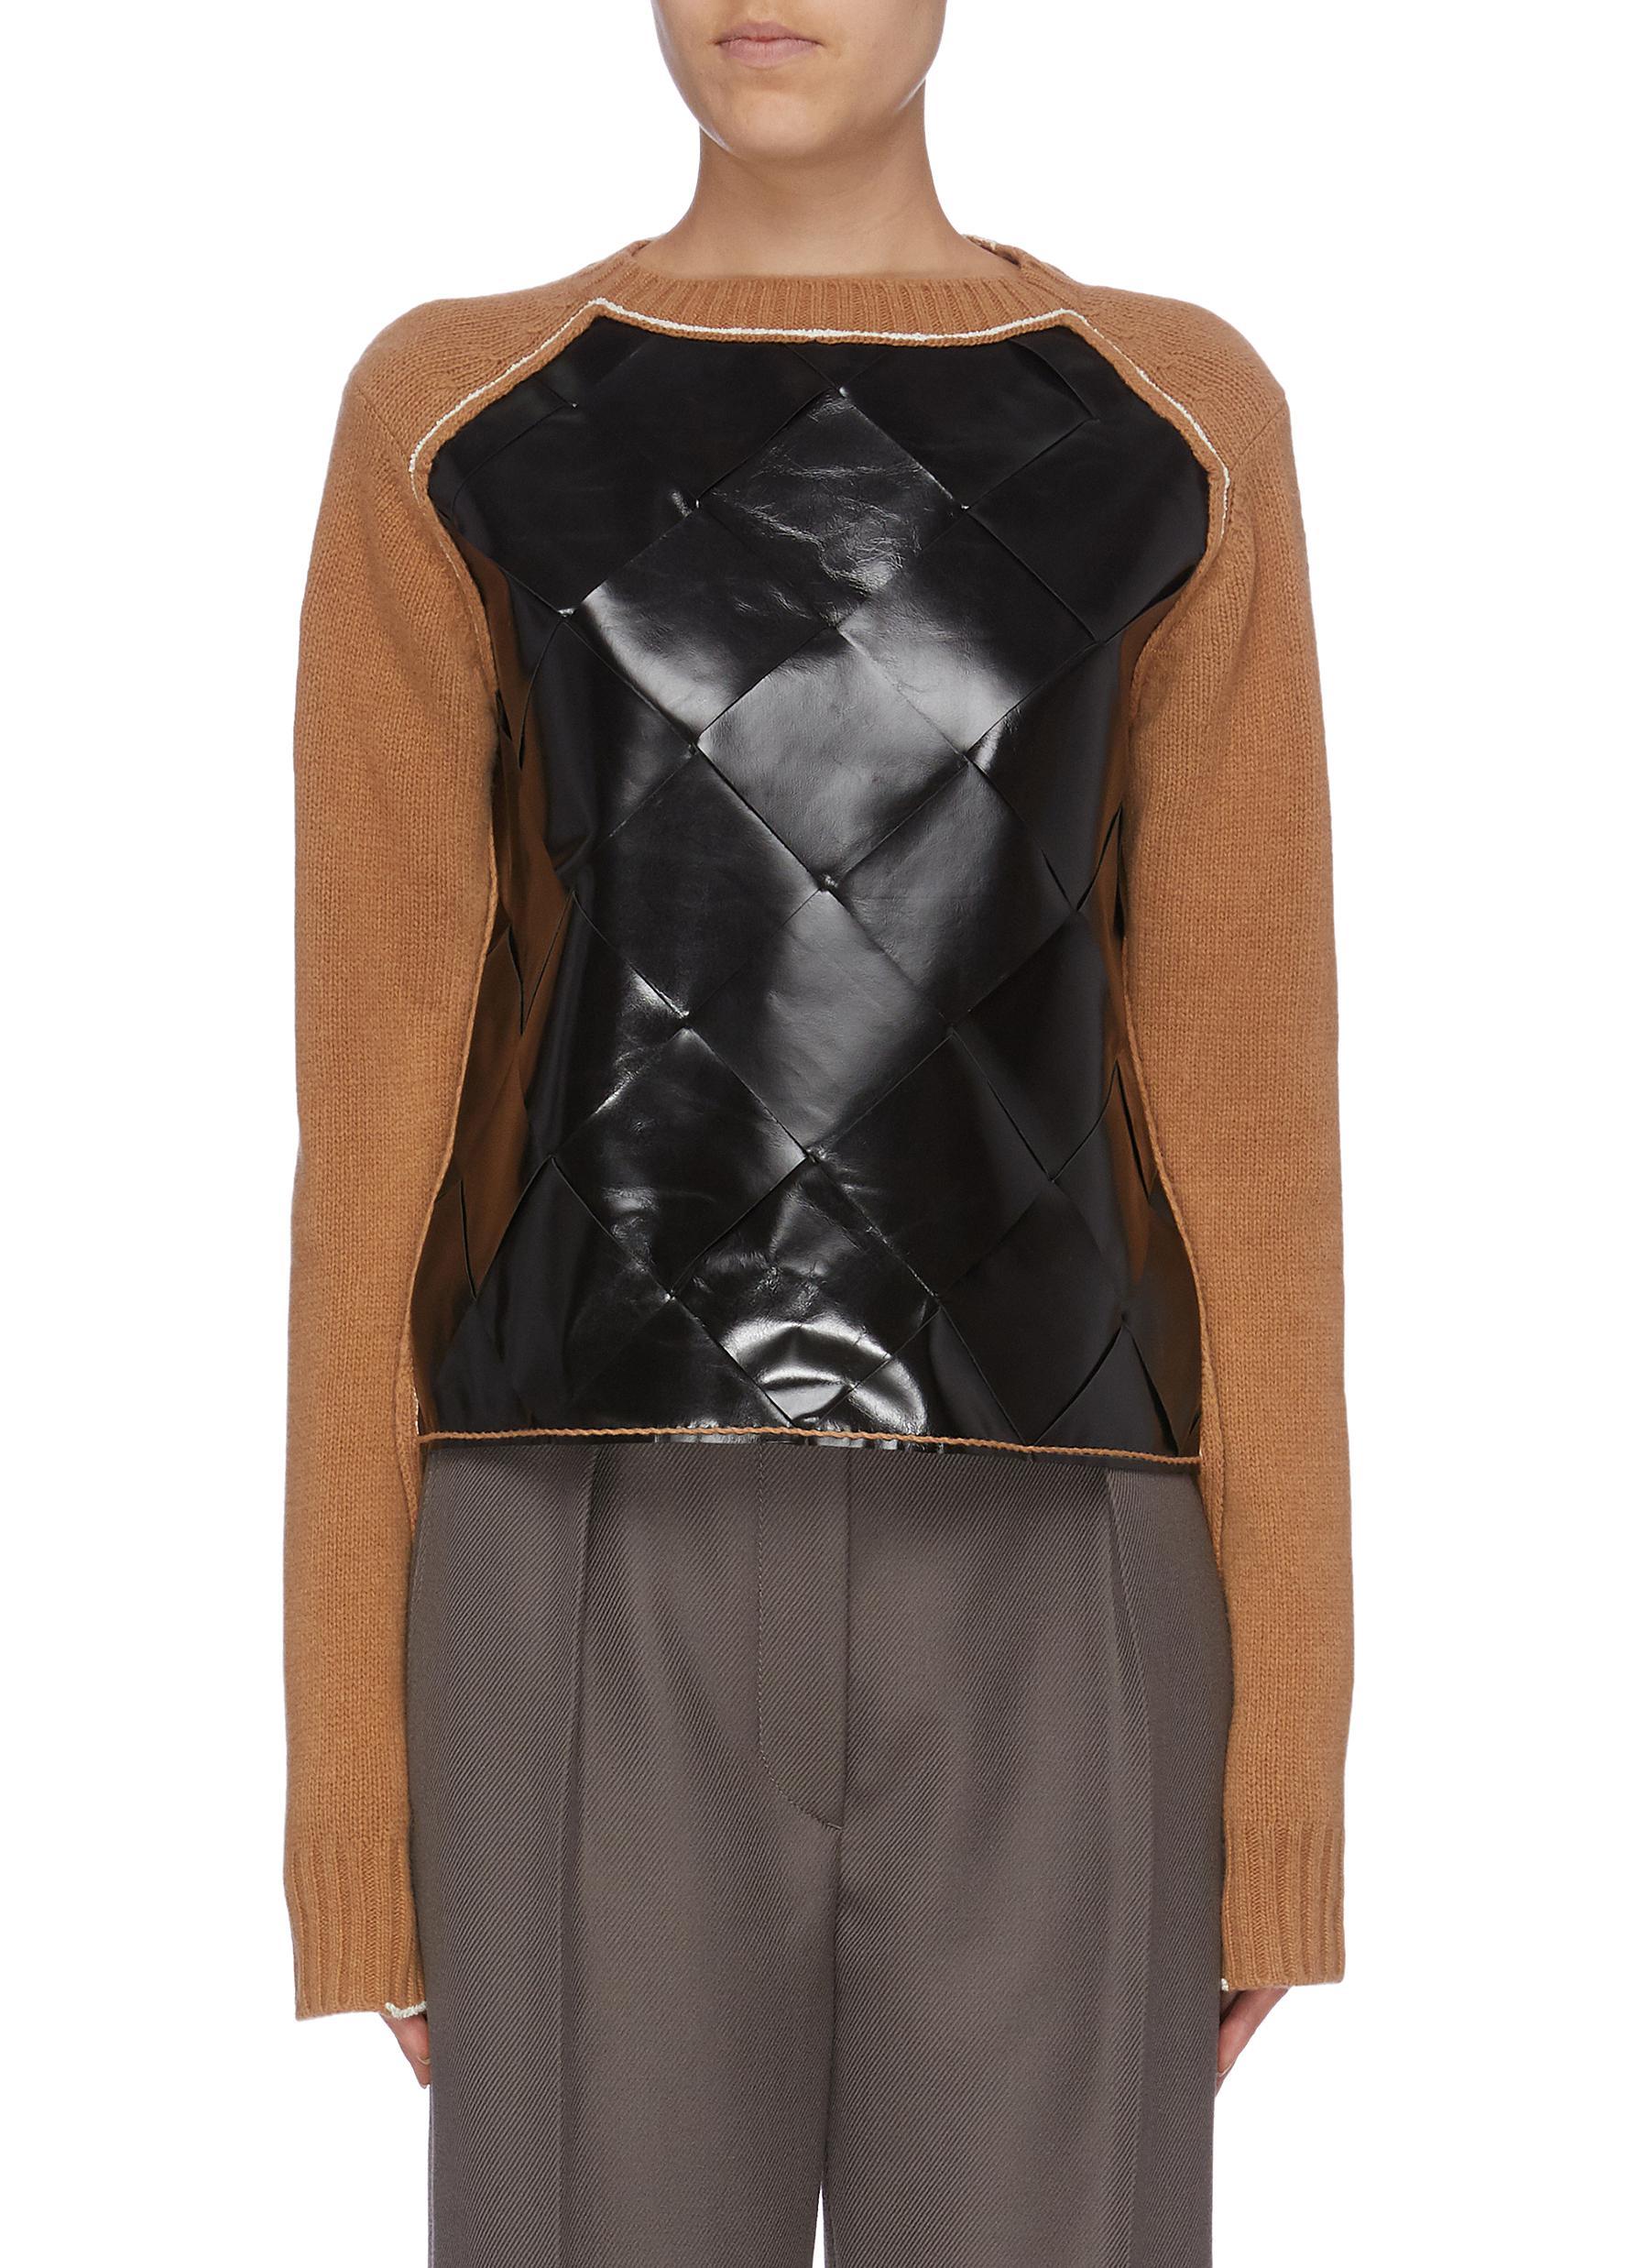 Colourblock woven leather panel wool sweater by Bottega Veneta